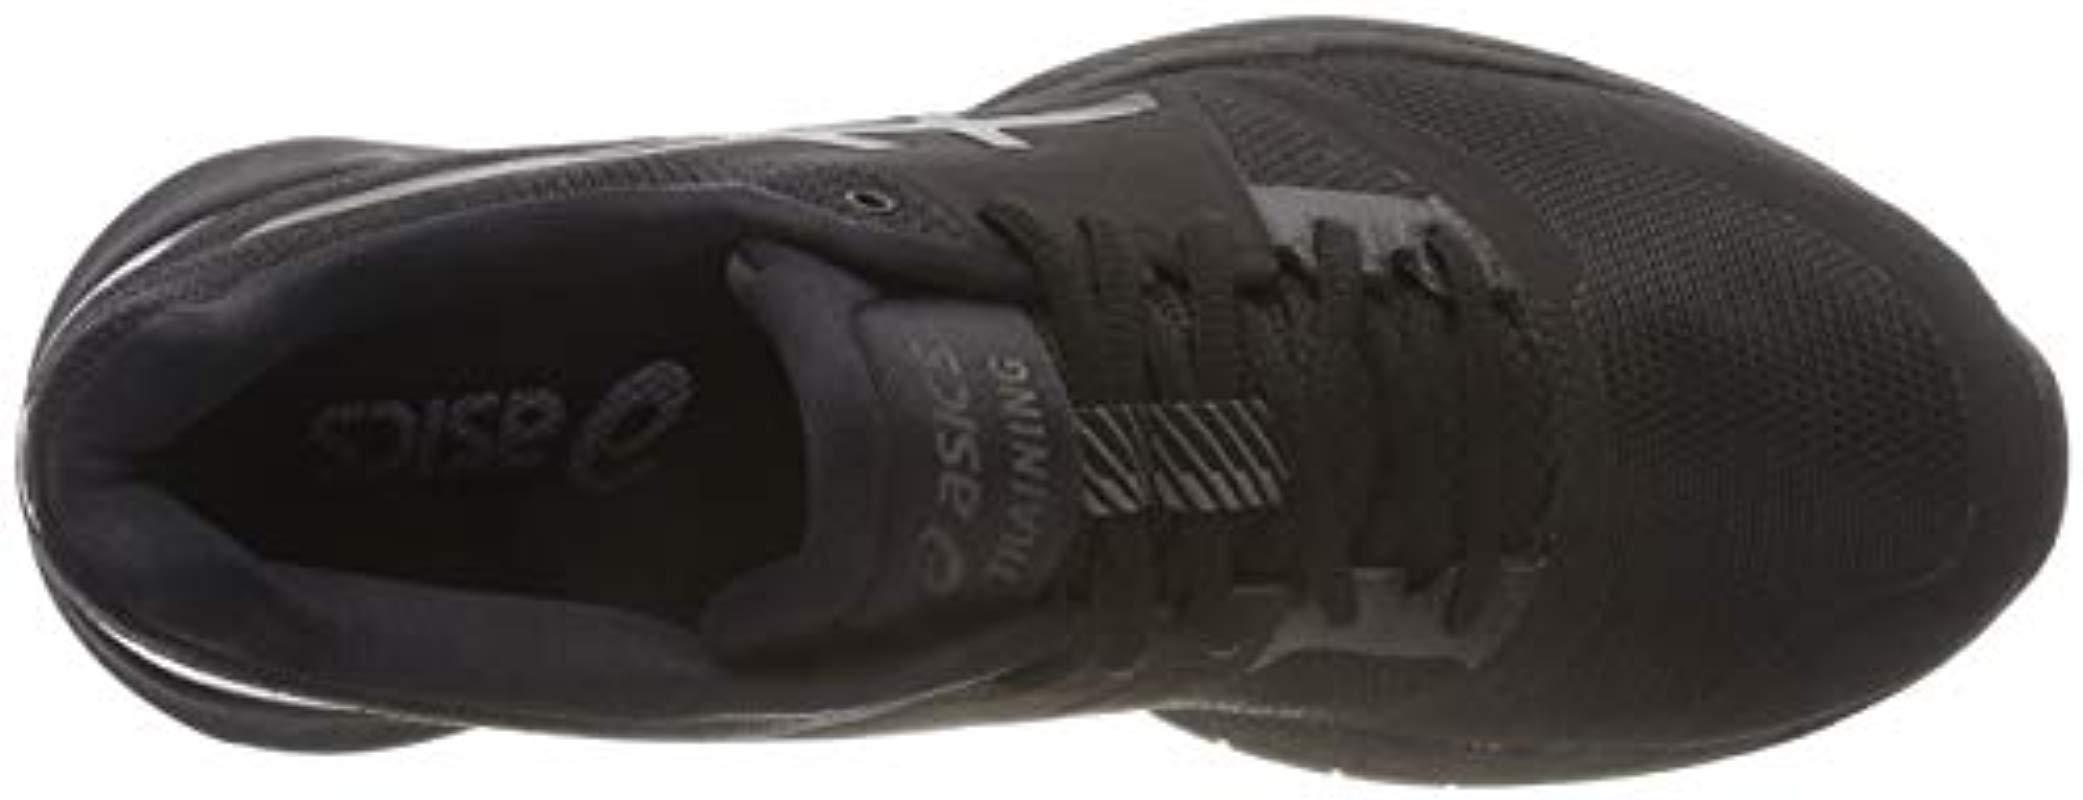 2ad04a311 Asics - Black Gel-quest Ff Running Shoes - Lyst. View fullscreen